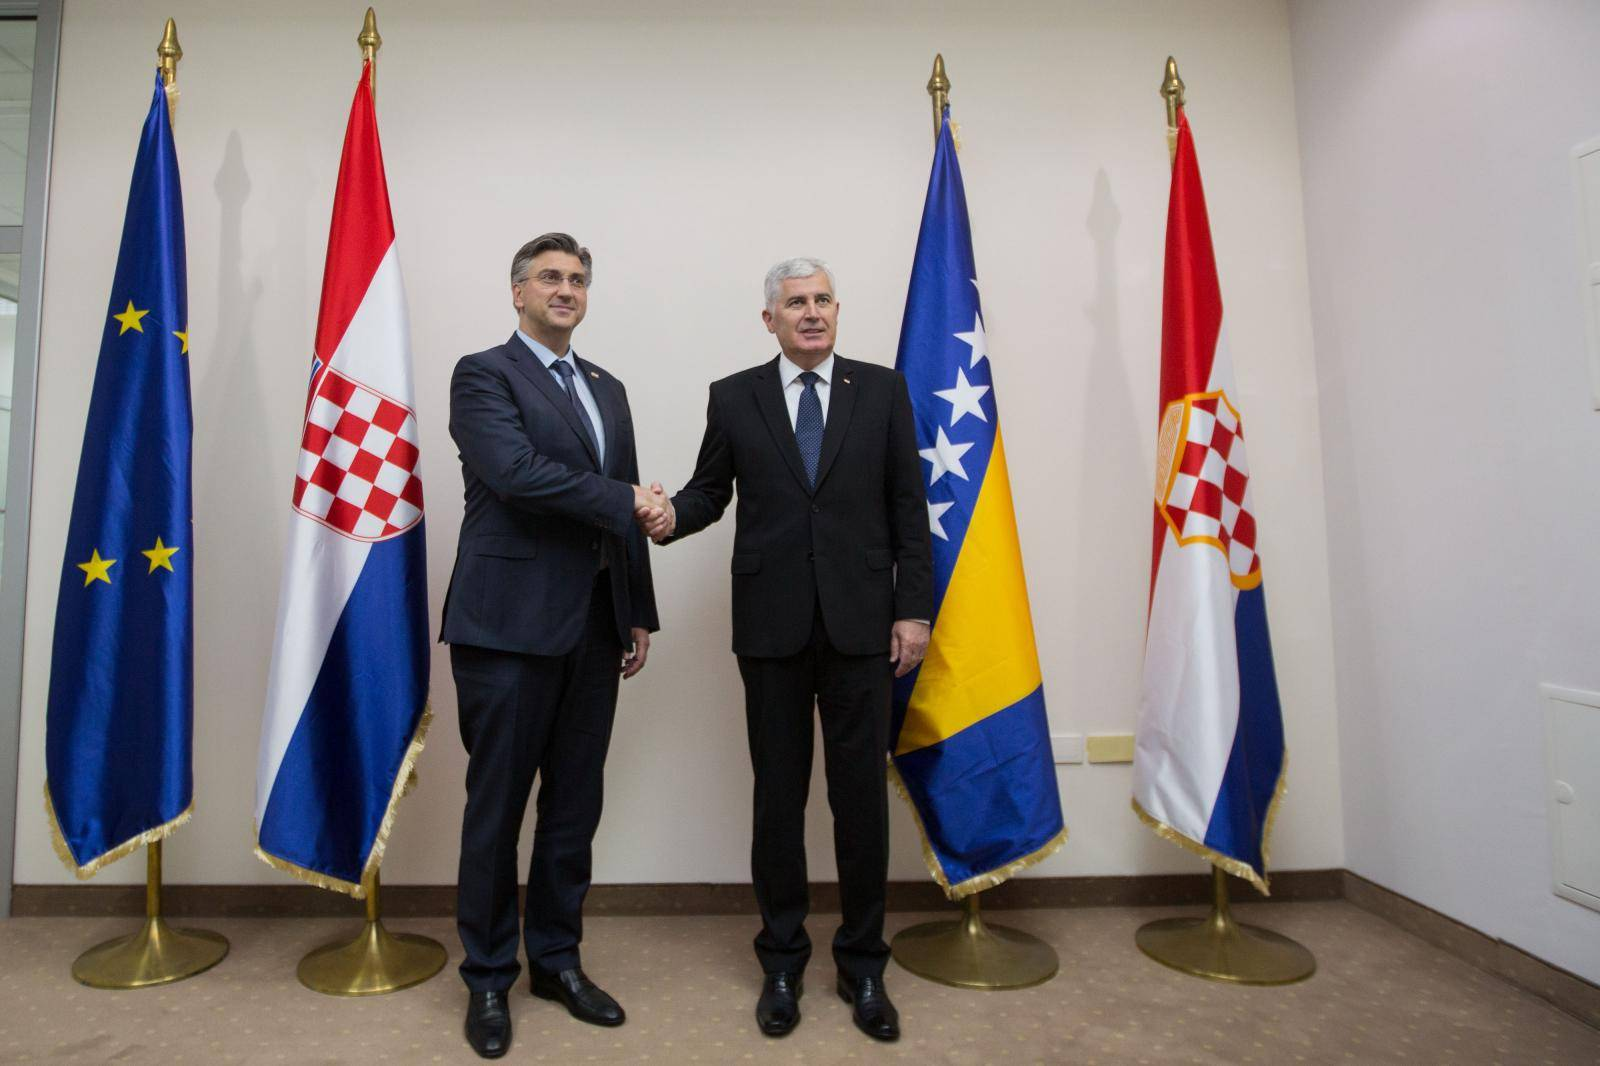 Mostar: Sastanak Dragana Čovića i Andreja Plenkovića